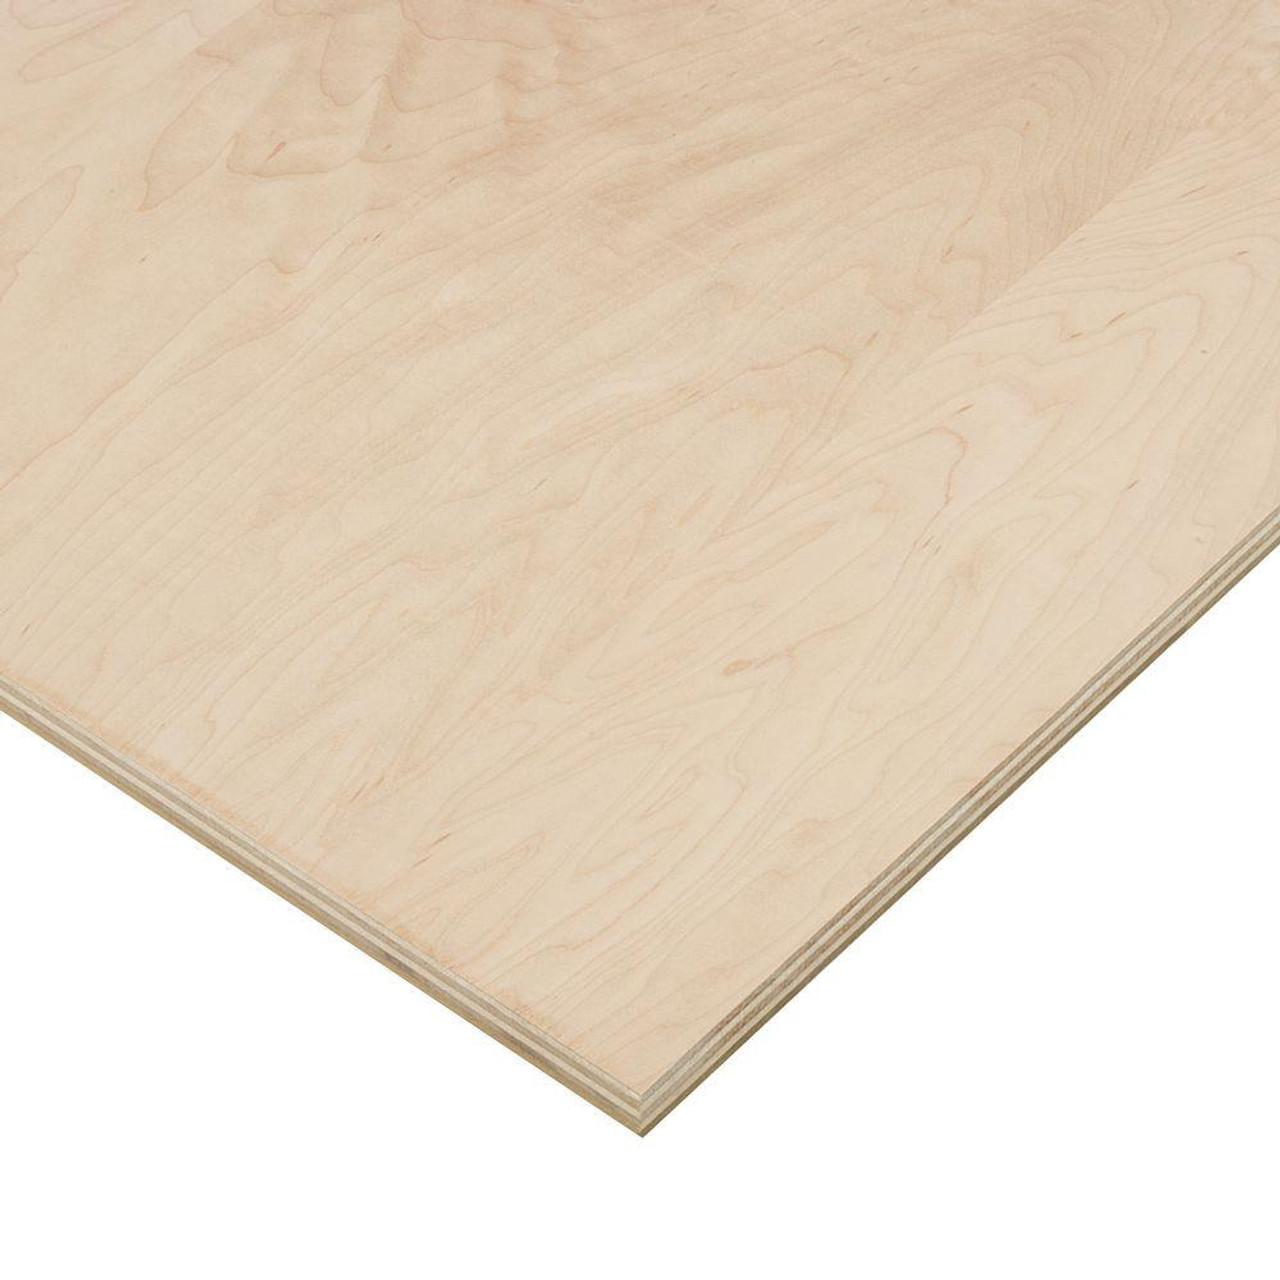 "Birch Wood 1/2"" 48"" x 96"""